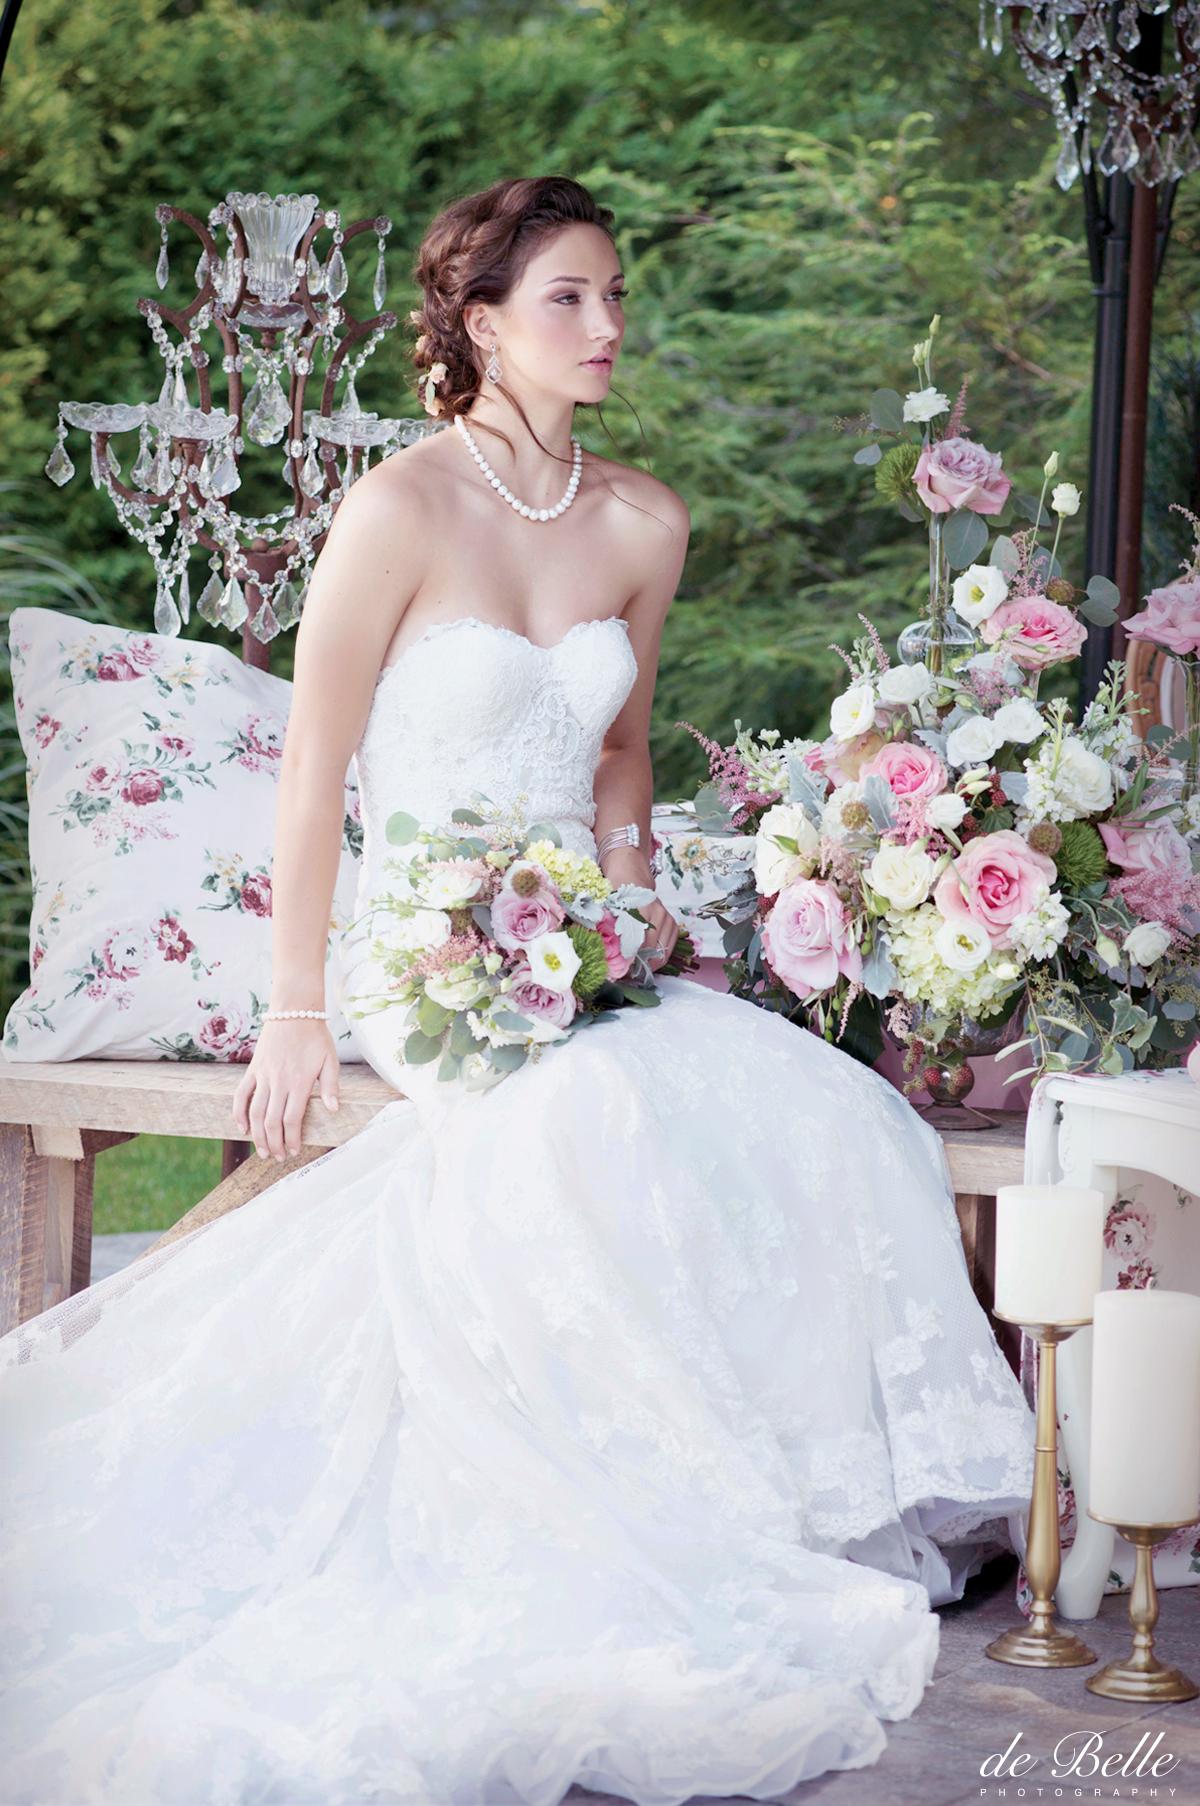 Montreal-Wedding-Photographer-Debelle-EW1